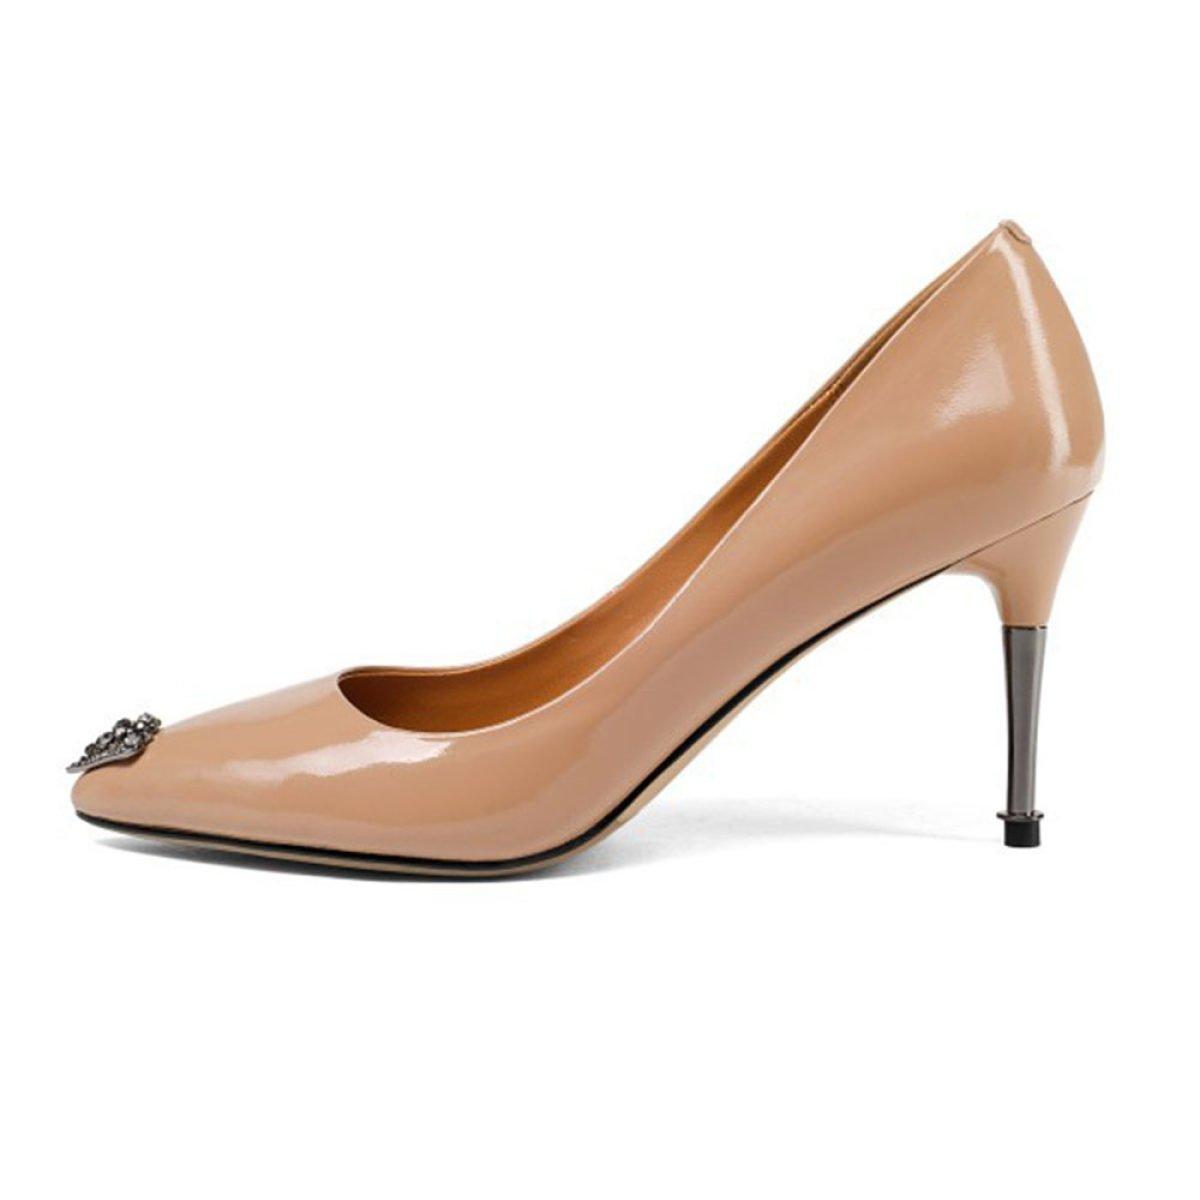 Frühling Neue Frauen Damen Lackleder Spitz High Heels Weibliche Strass Schuhe Pumps High Heel Party Büroarbeit Gericht Schuhe